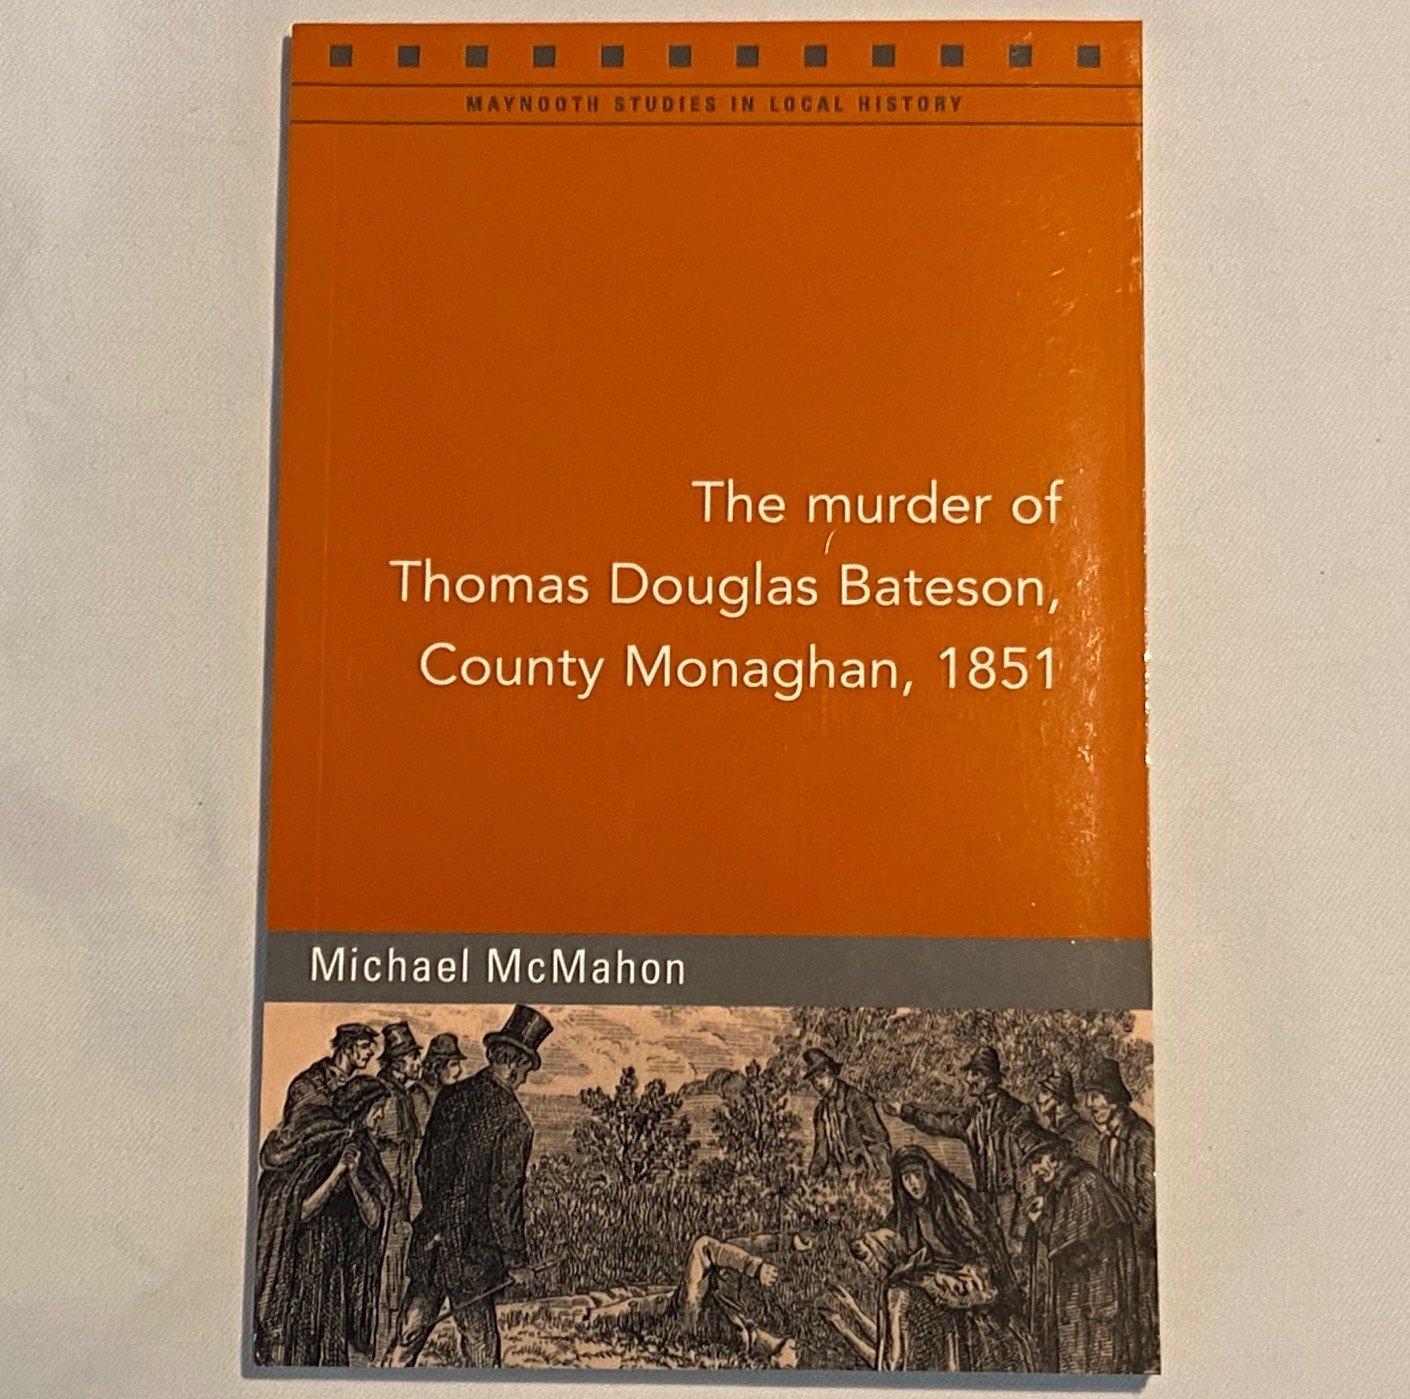 Image of The Murder of Thomas Douglas Bateson, County Monaghan, 1851